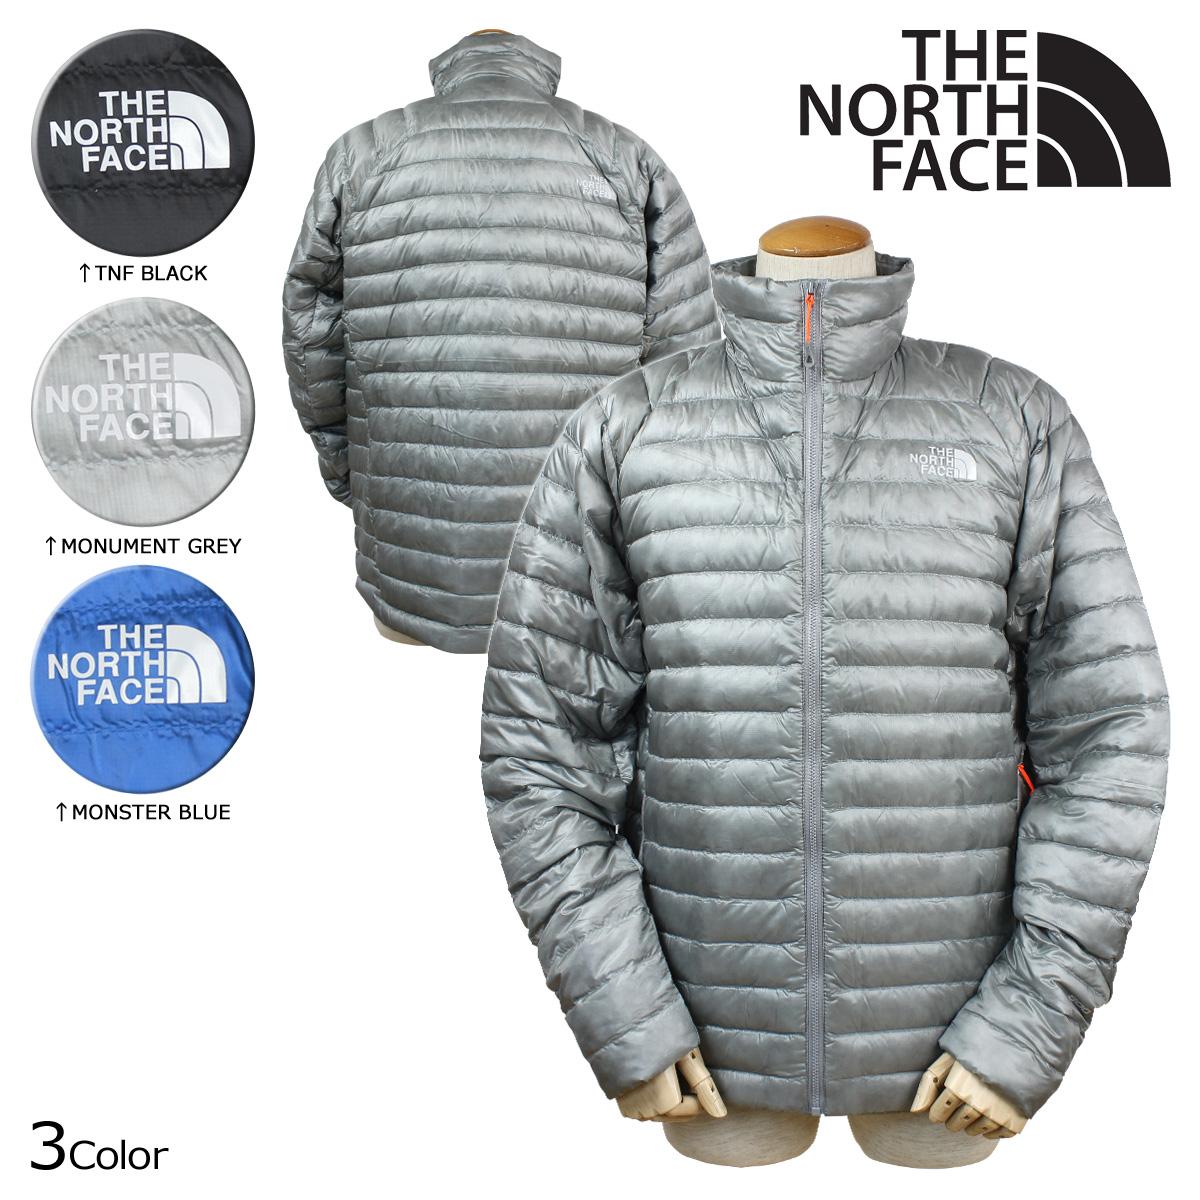 924b98e28 ireland the north face mens quince vest 06ad3 73c8c